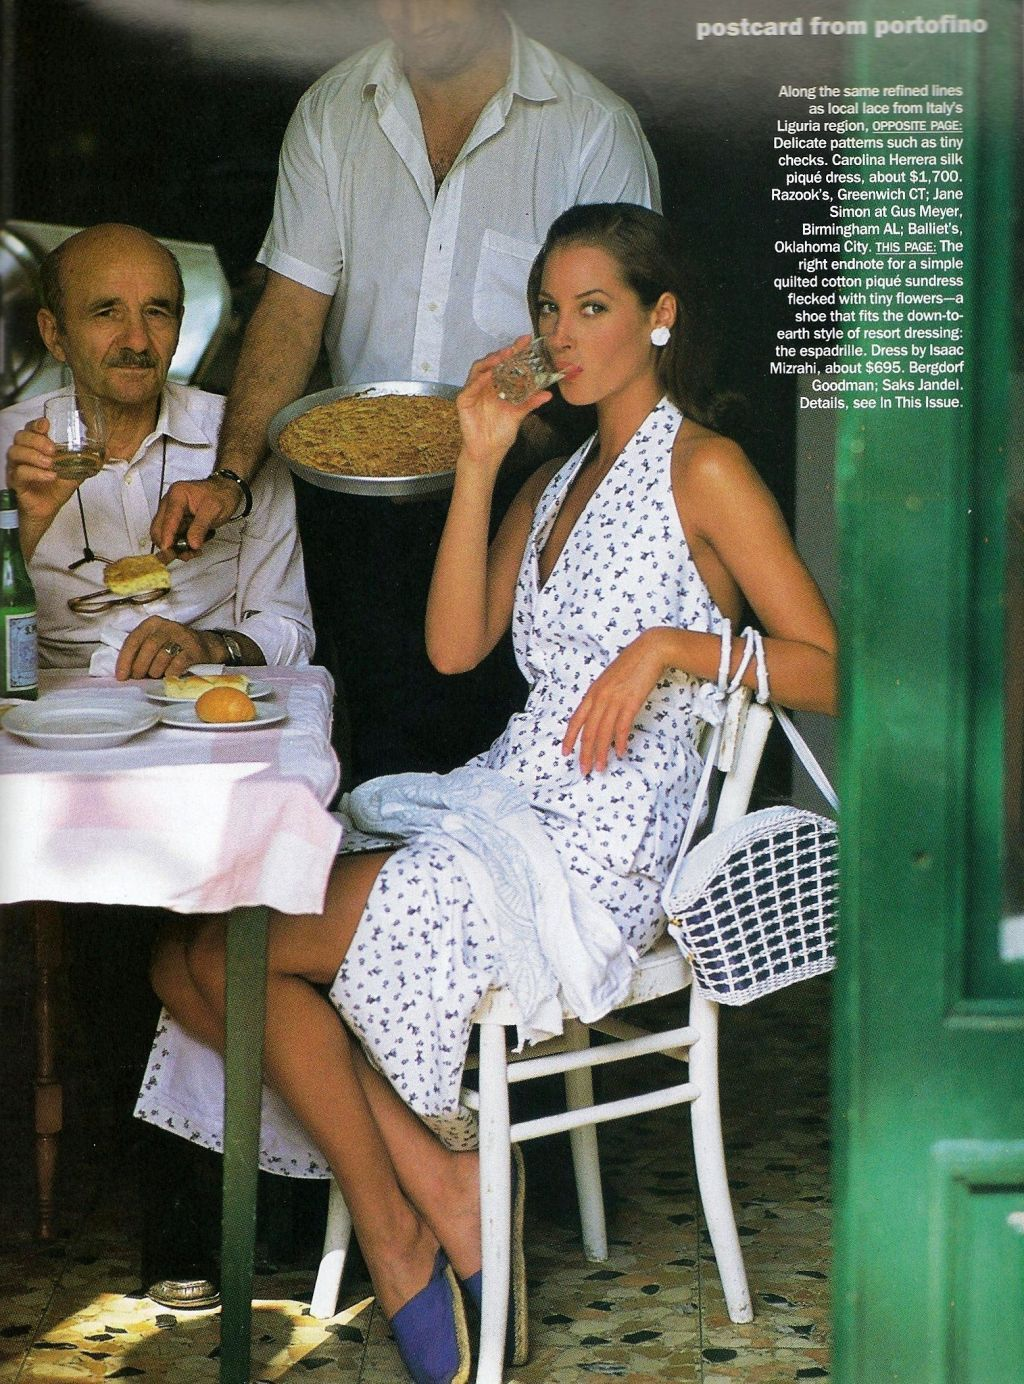 christy-turlington-timeless-summer-style-postcard-from-portofino---.jpg